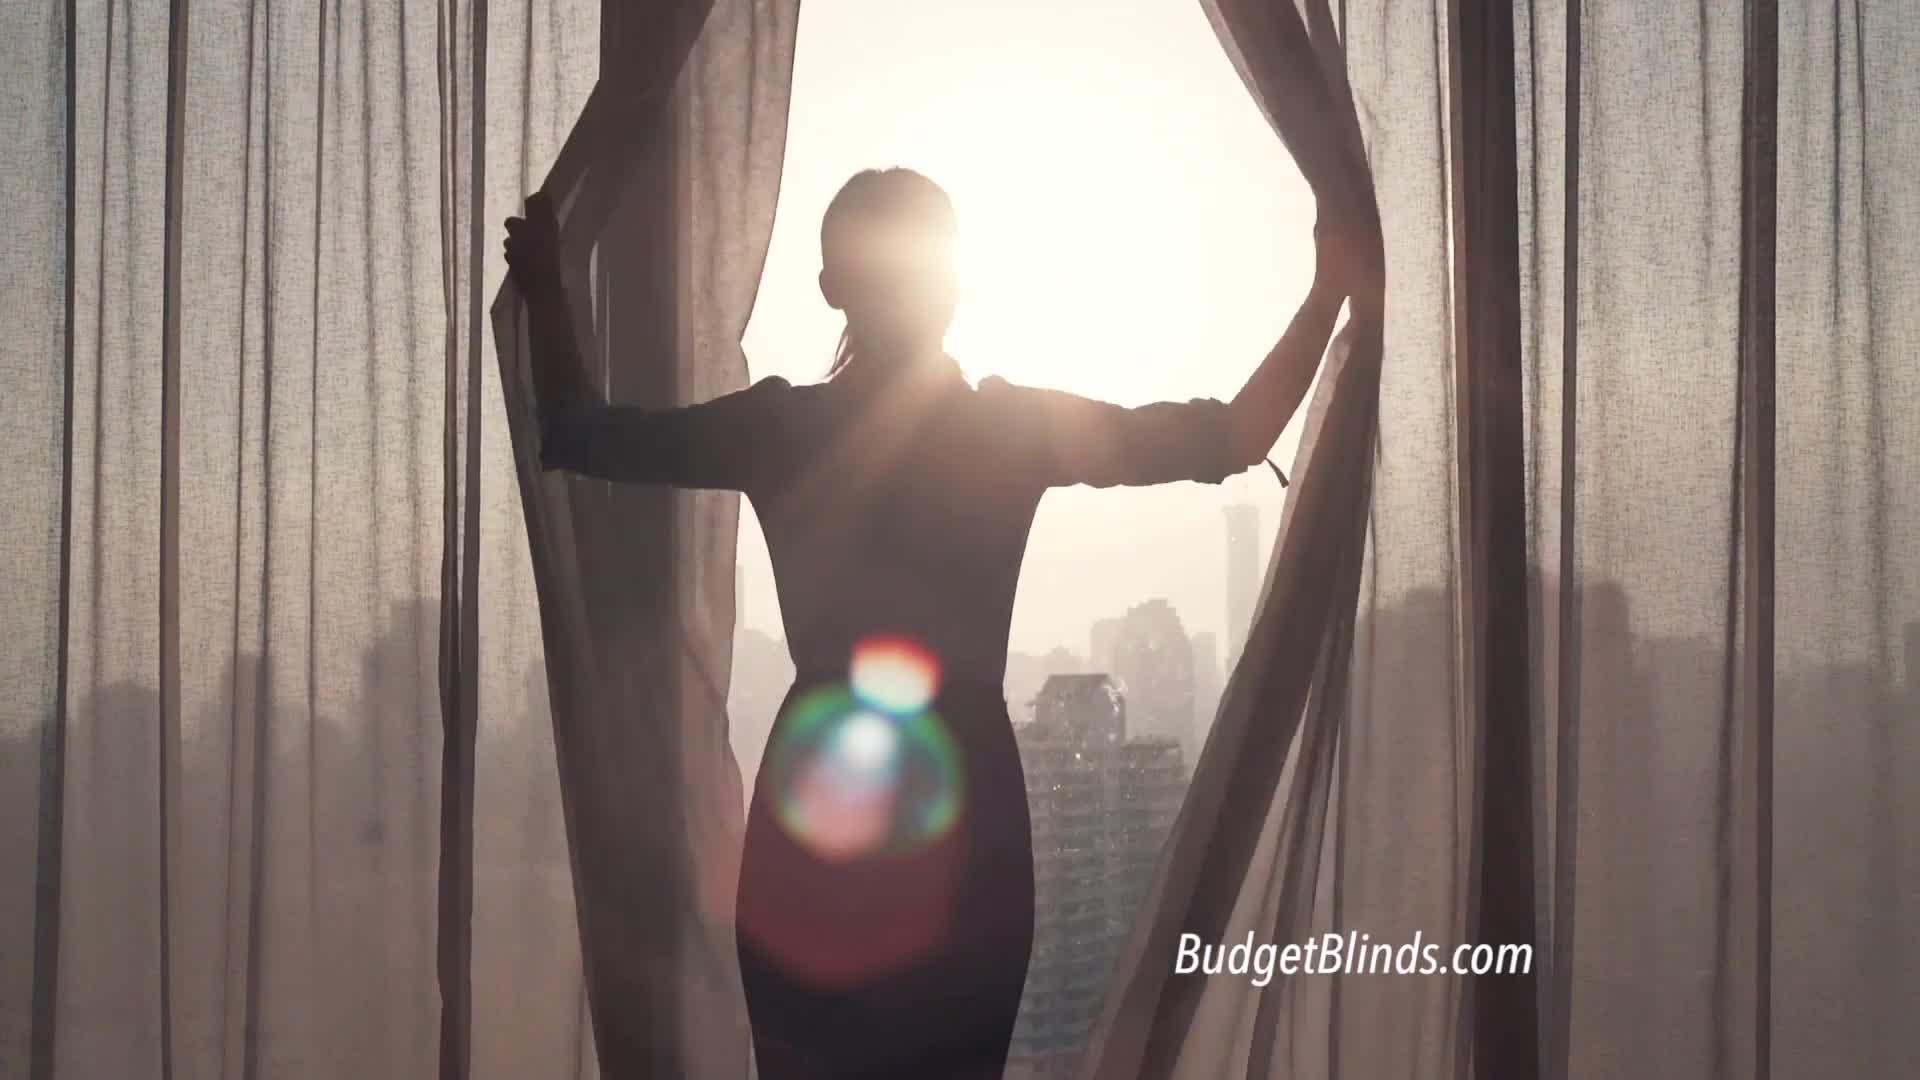 View Budget Blinds's Richmond profile